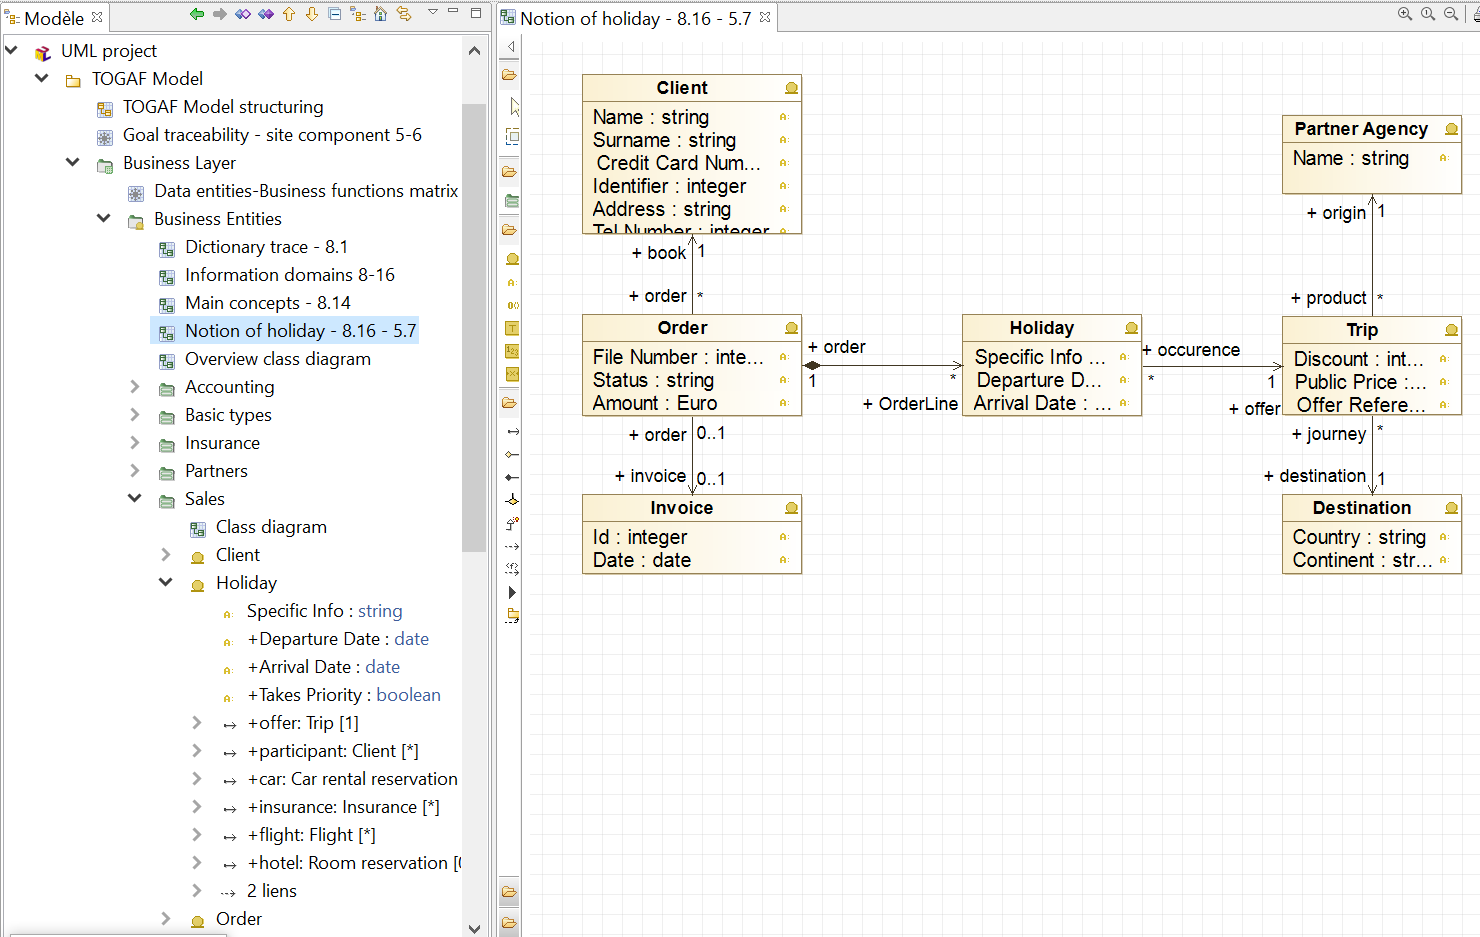 diagramme-entites-metier-togaf-vue-detaillee-avec-attributs-tutorial-1.PNG